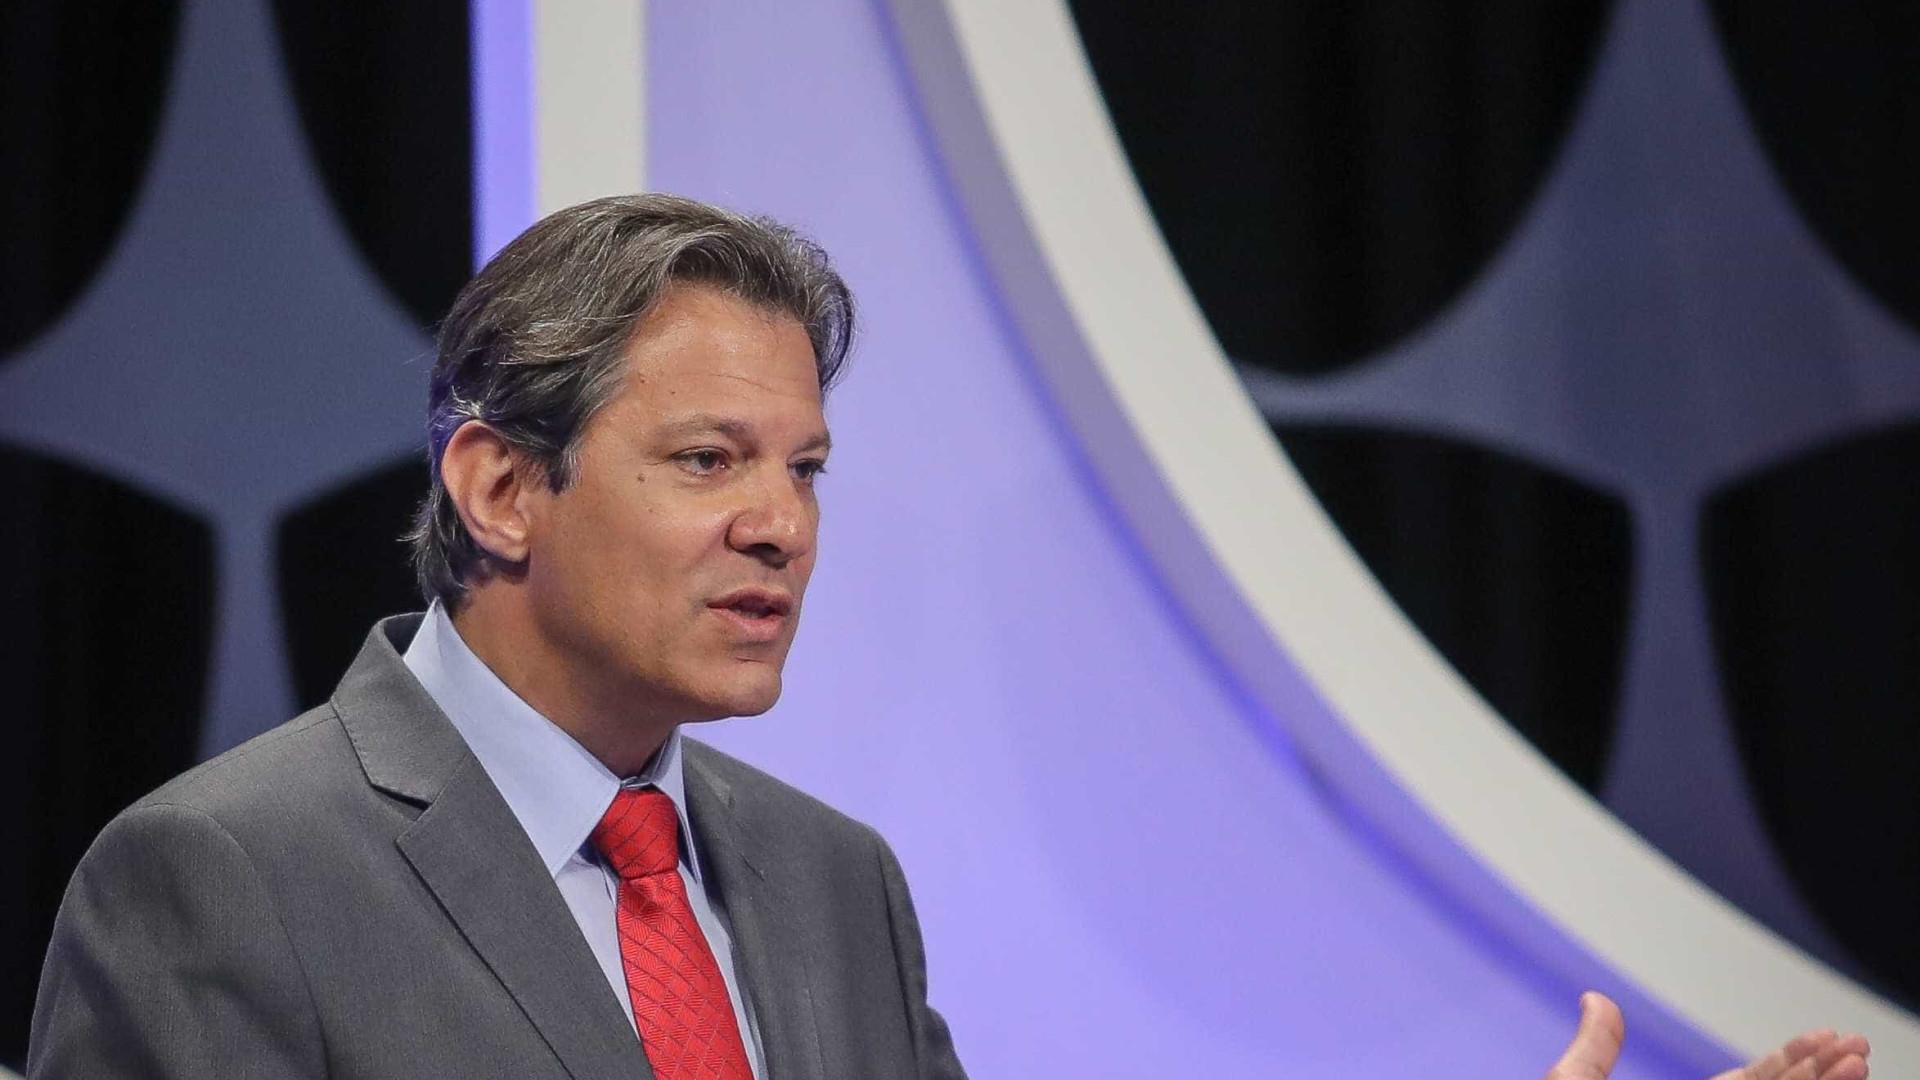 Cortella agradece Haddad , mas nega convite para Ministério da Educação